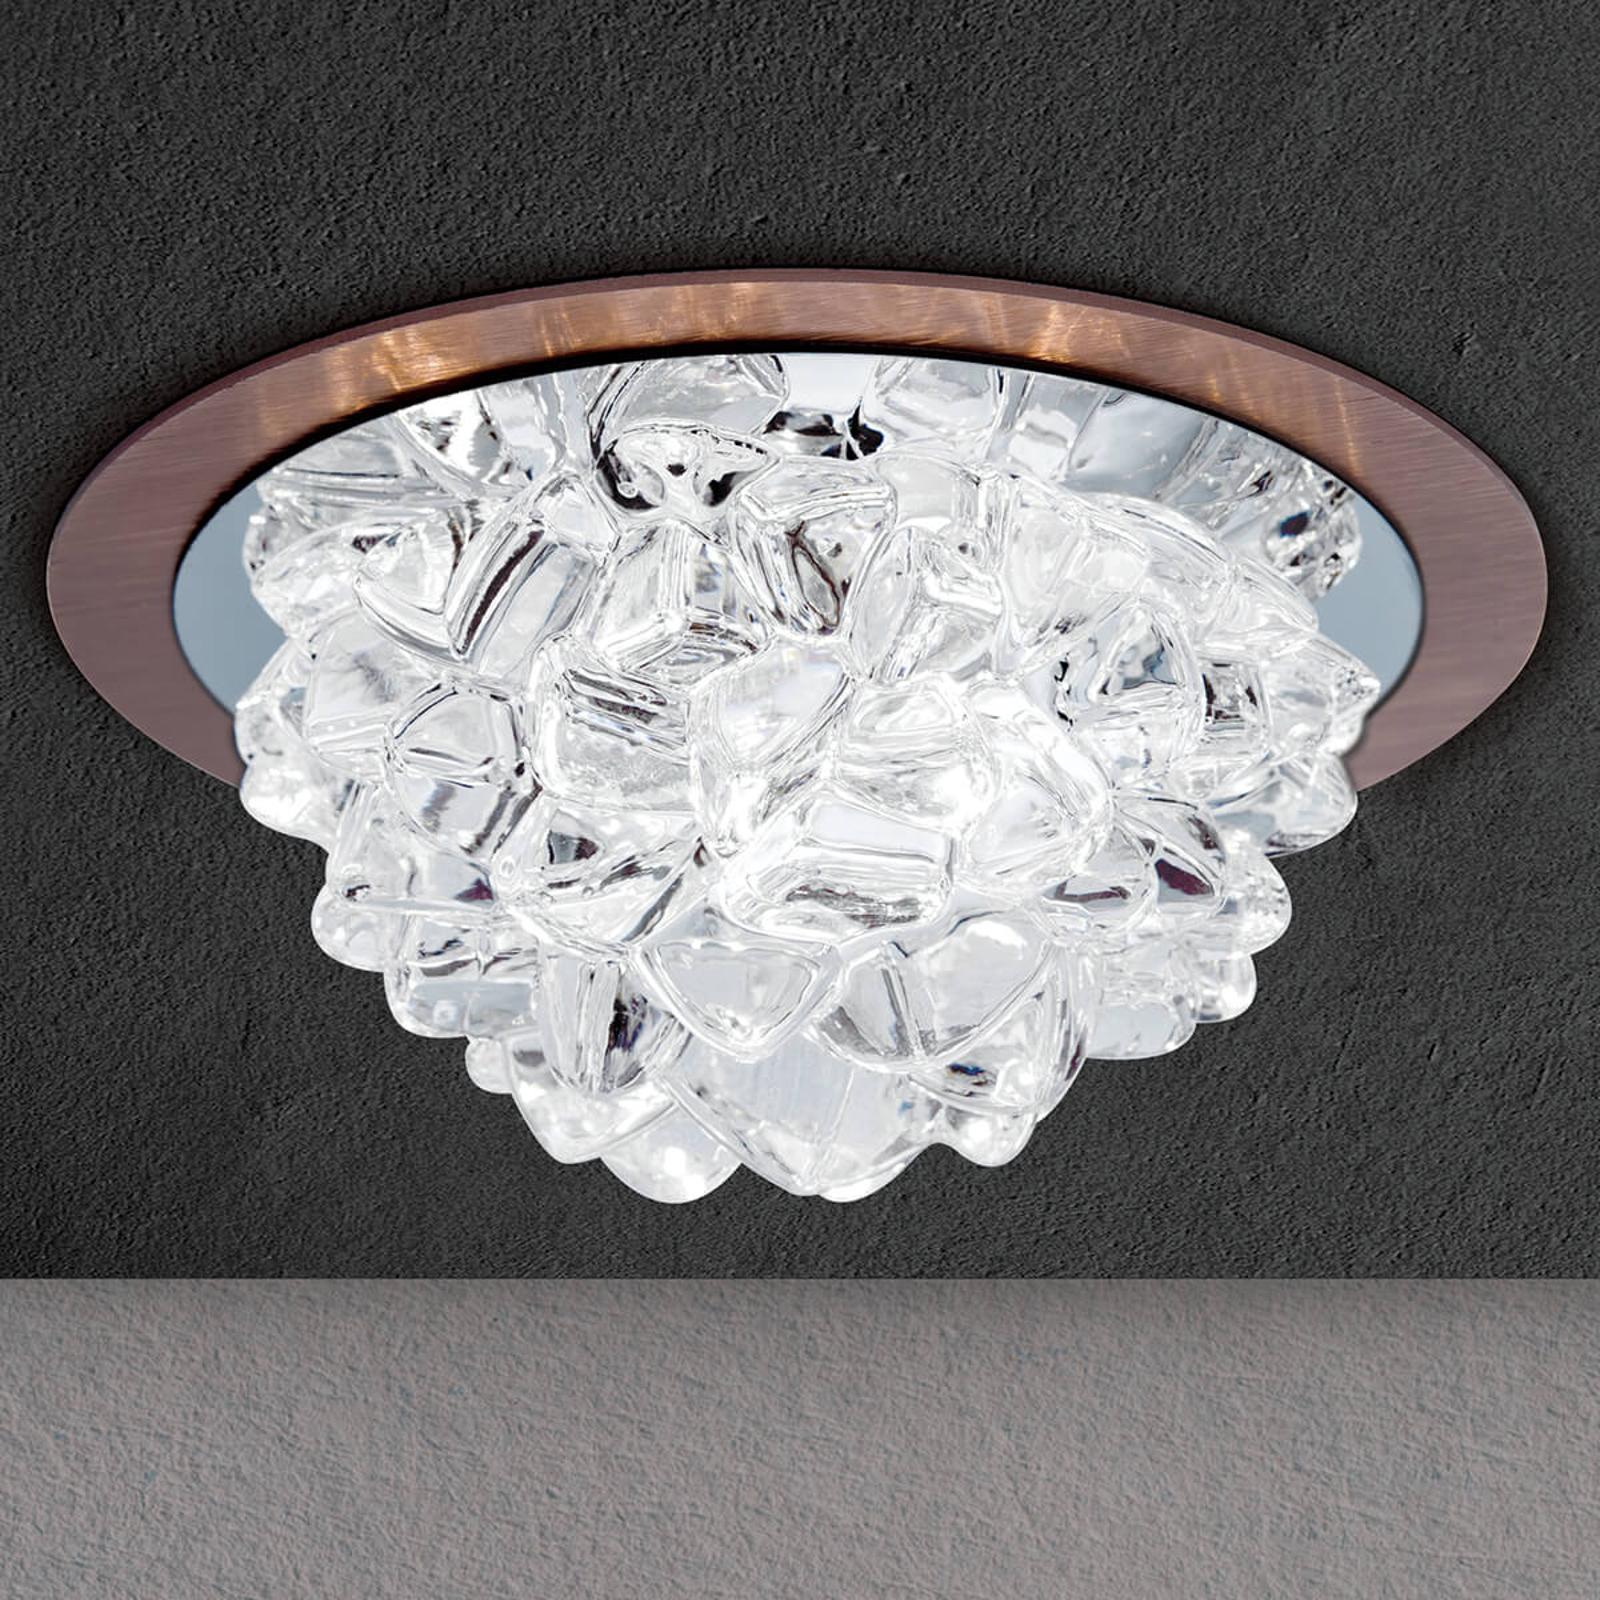 LED-innfellingslampe Cecil, krystall bronse